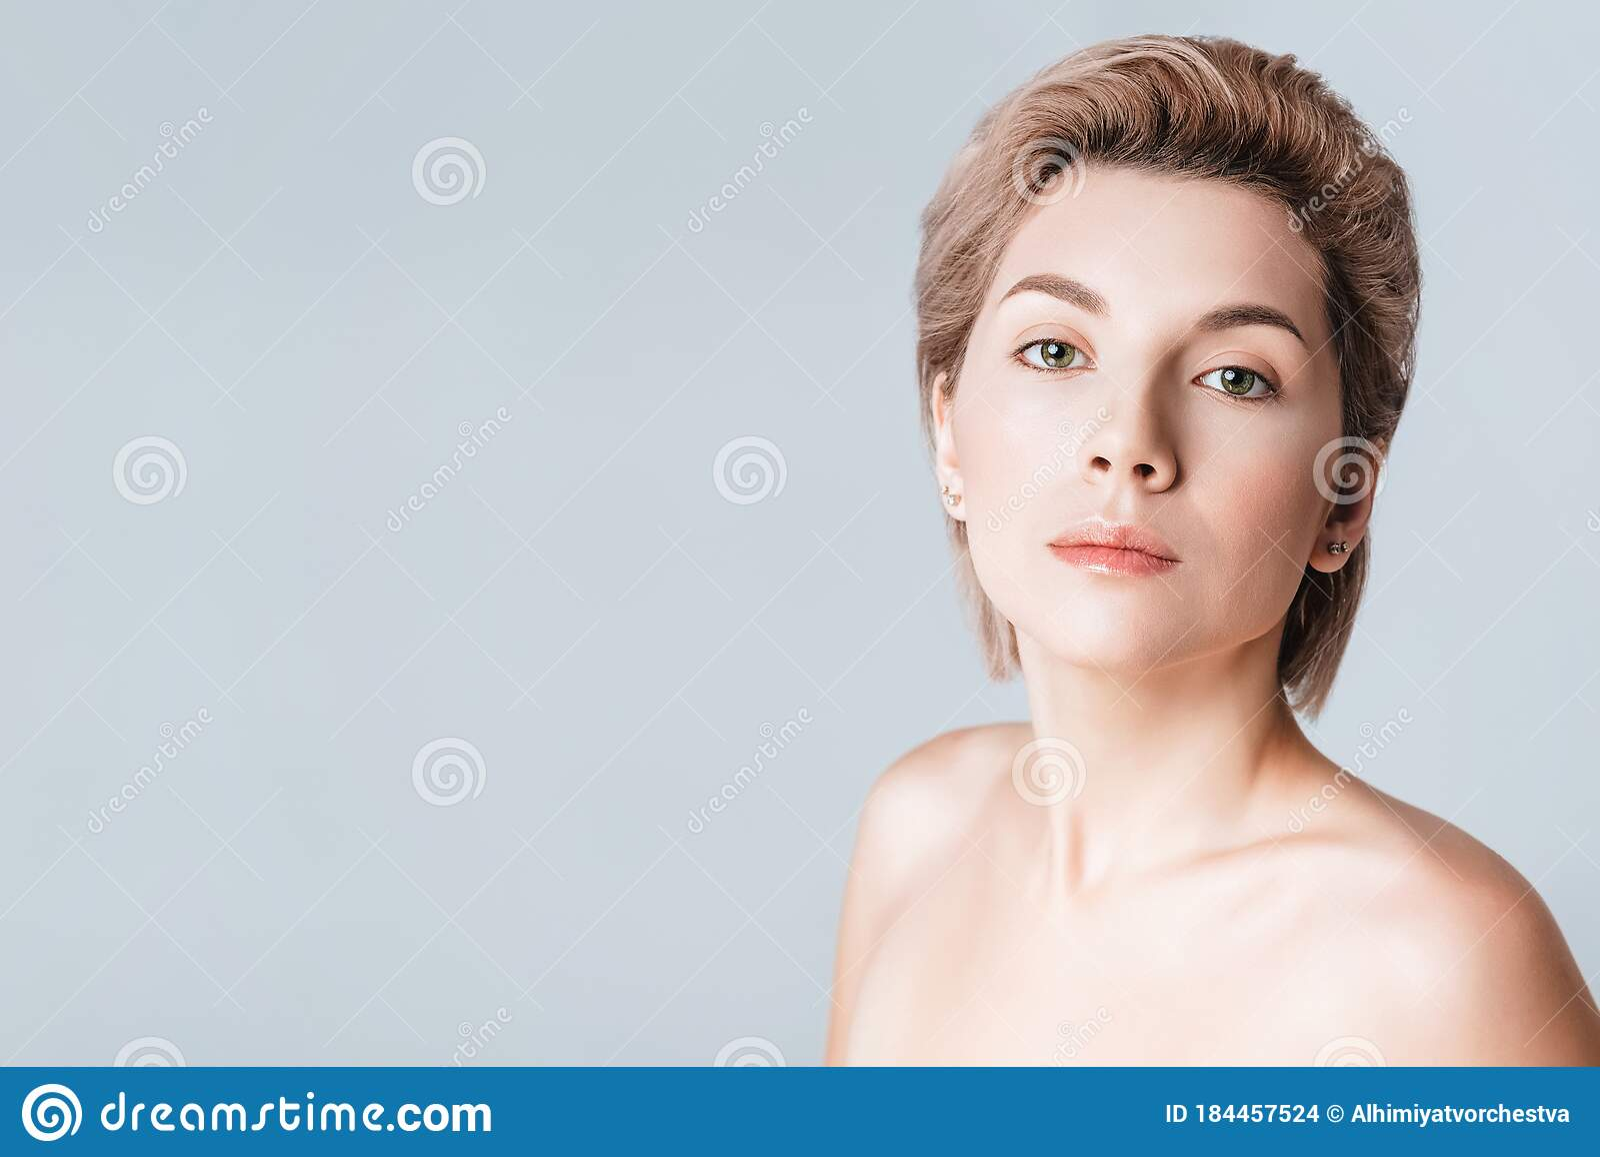 Celebrity Nude Short Hair Blonde Girls Pics